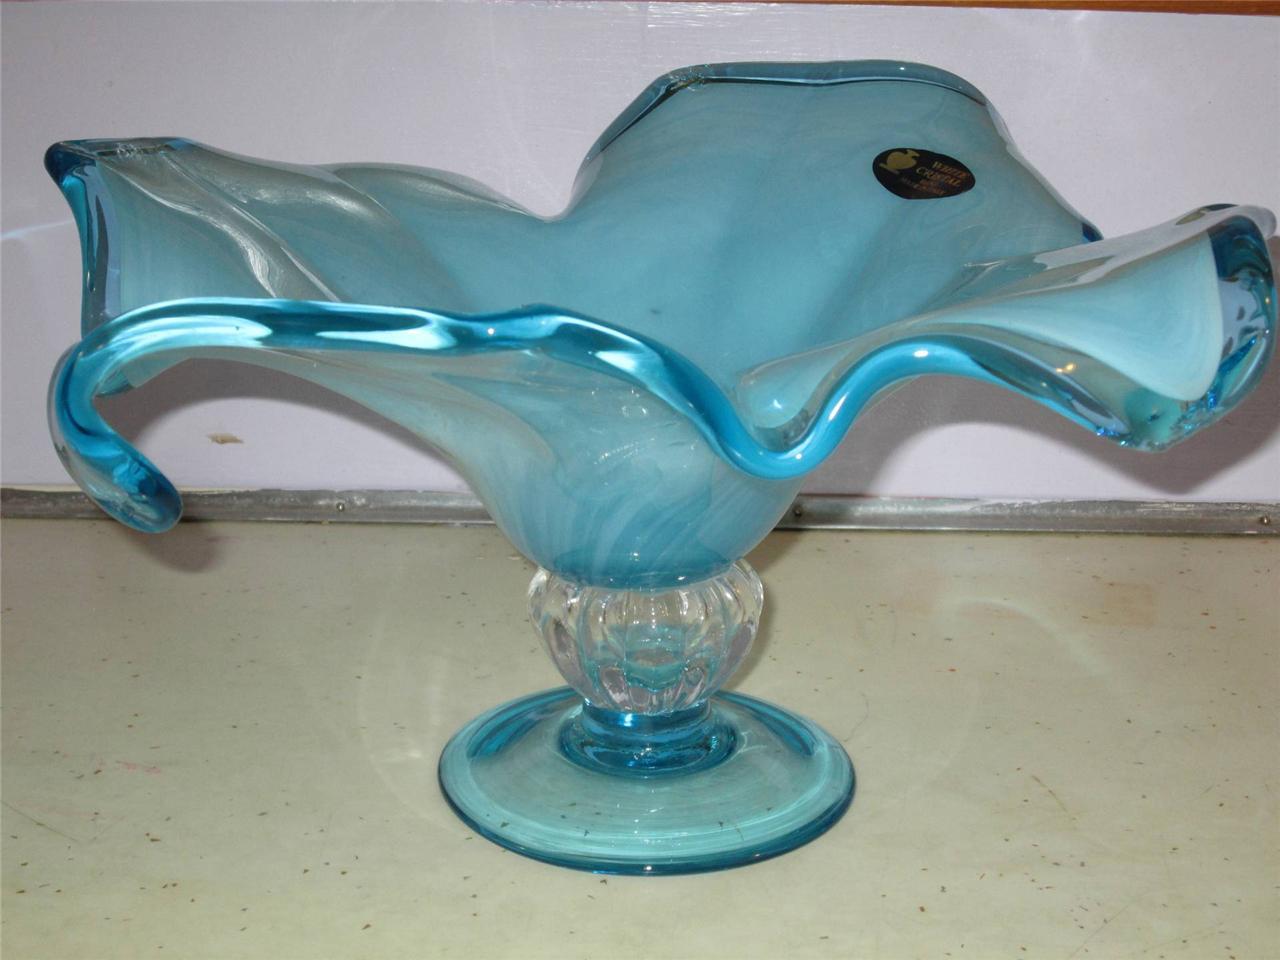 Vintage white cristal murano art glass milky blue